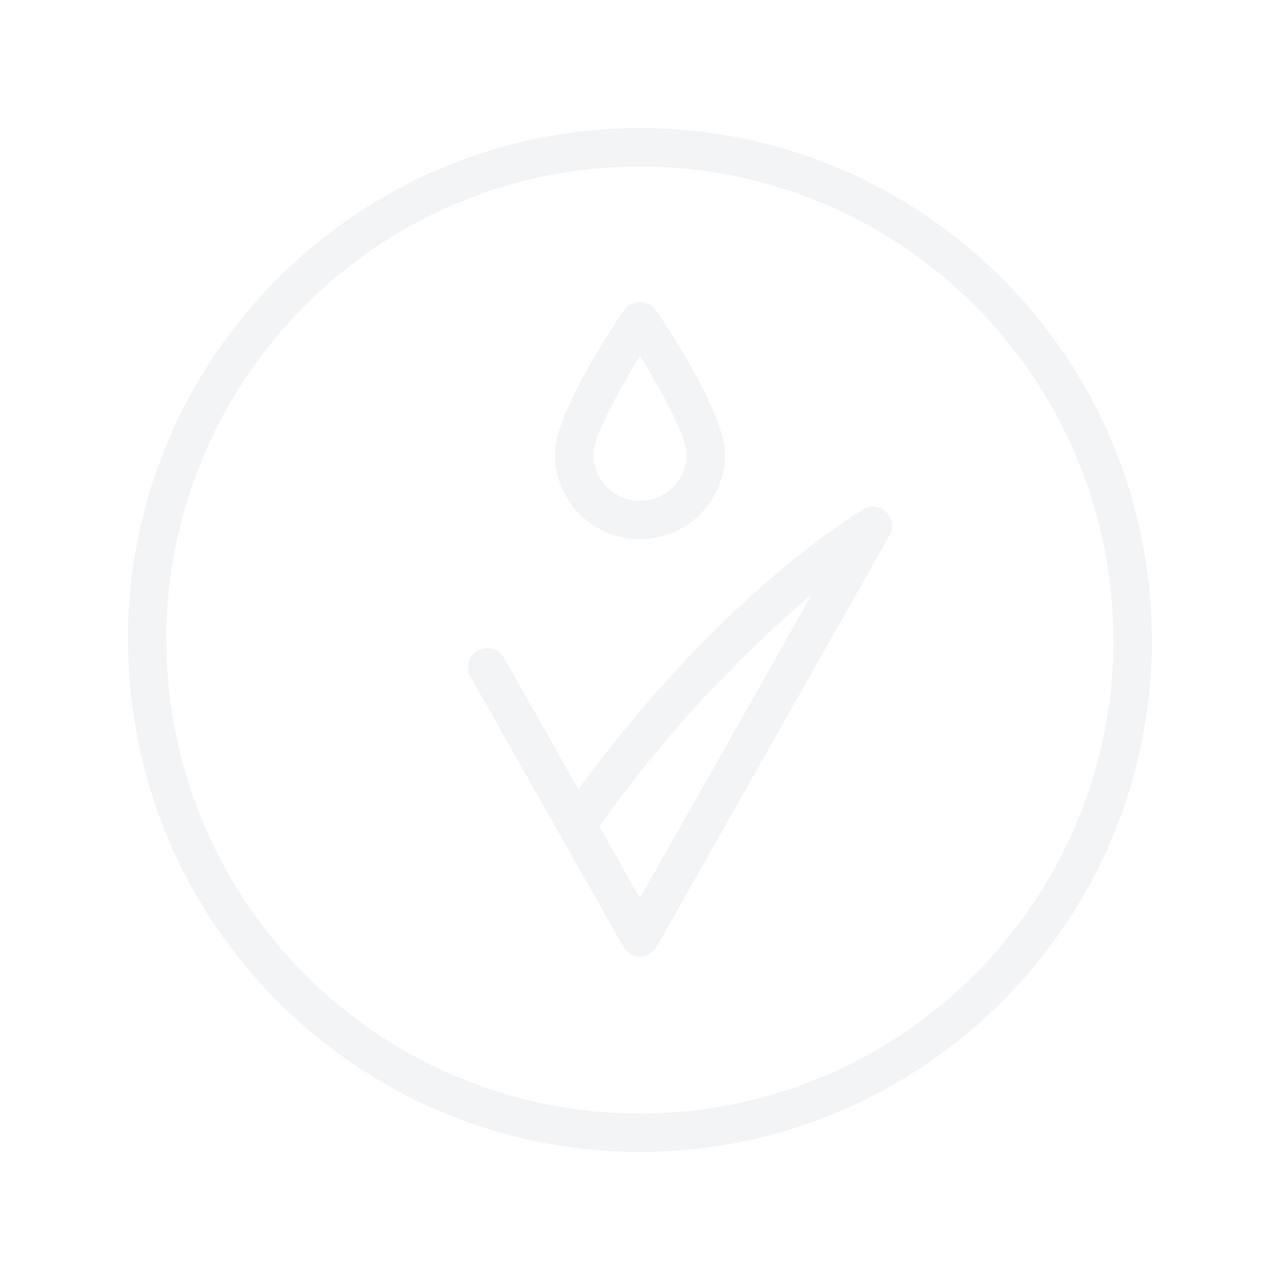 CHLOE 50ml Eau De Parfum Gift Set